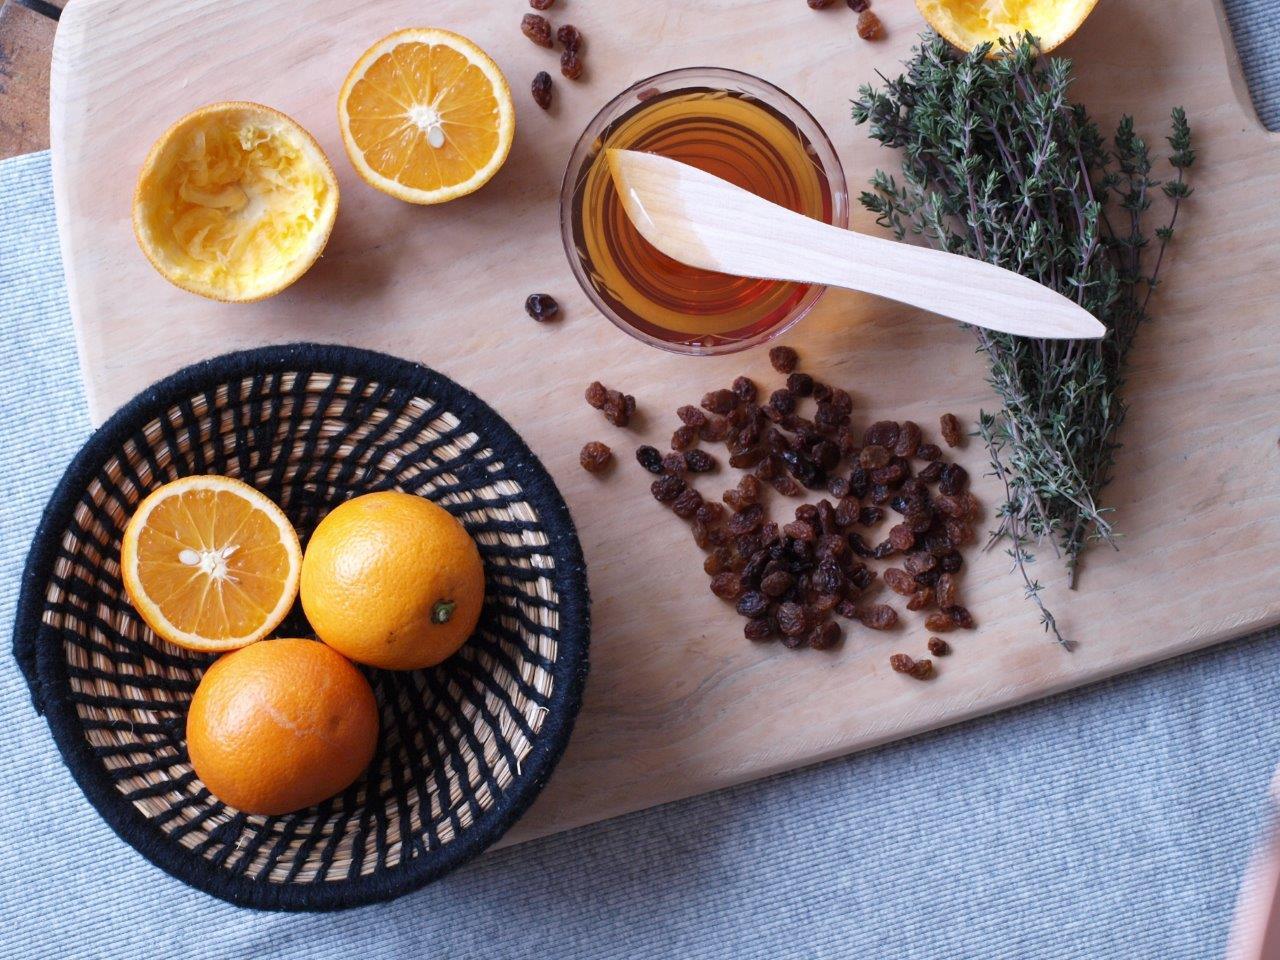 salade d'oranges - ingrédients